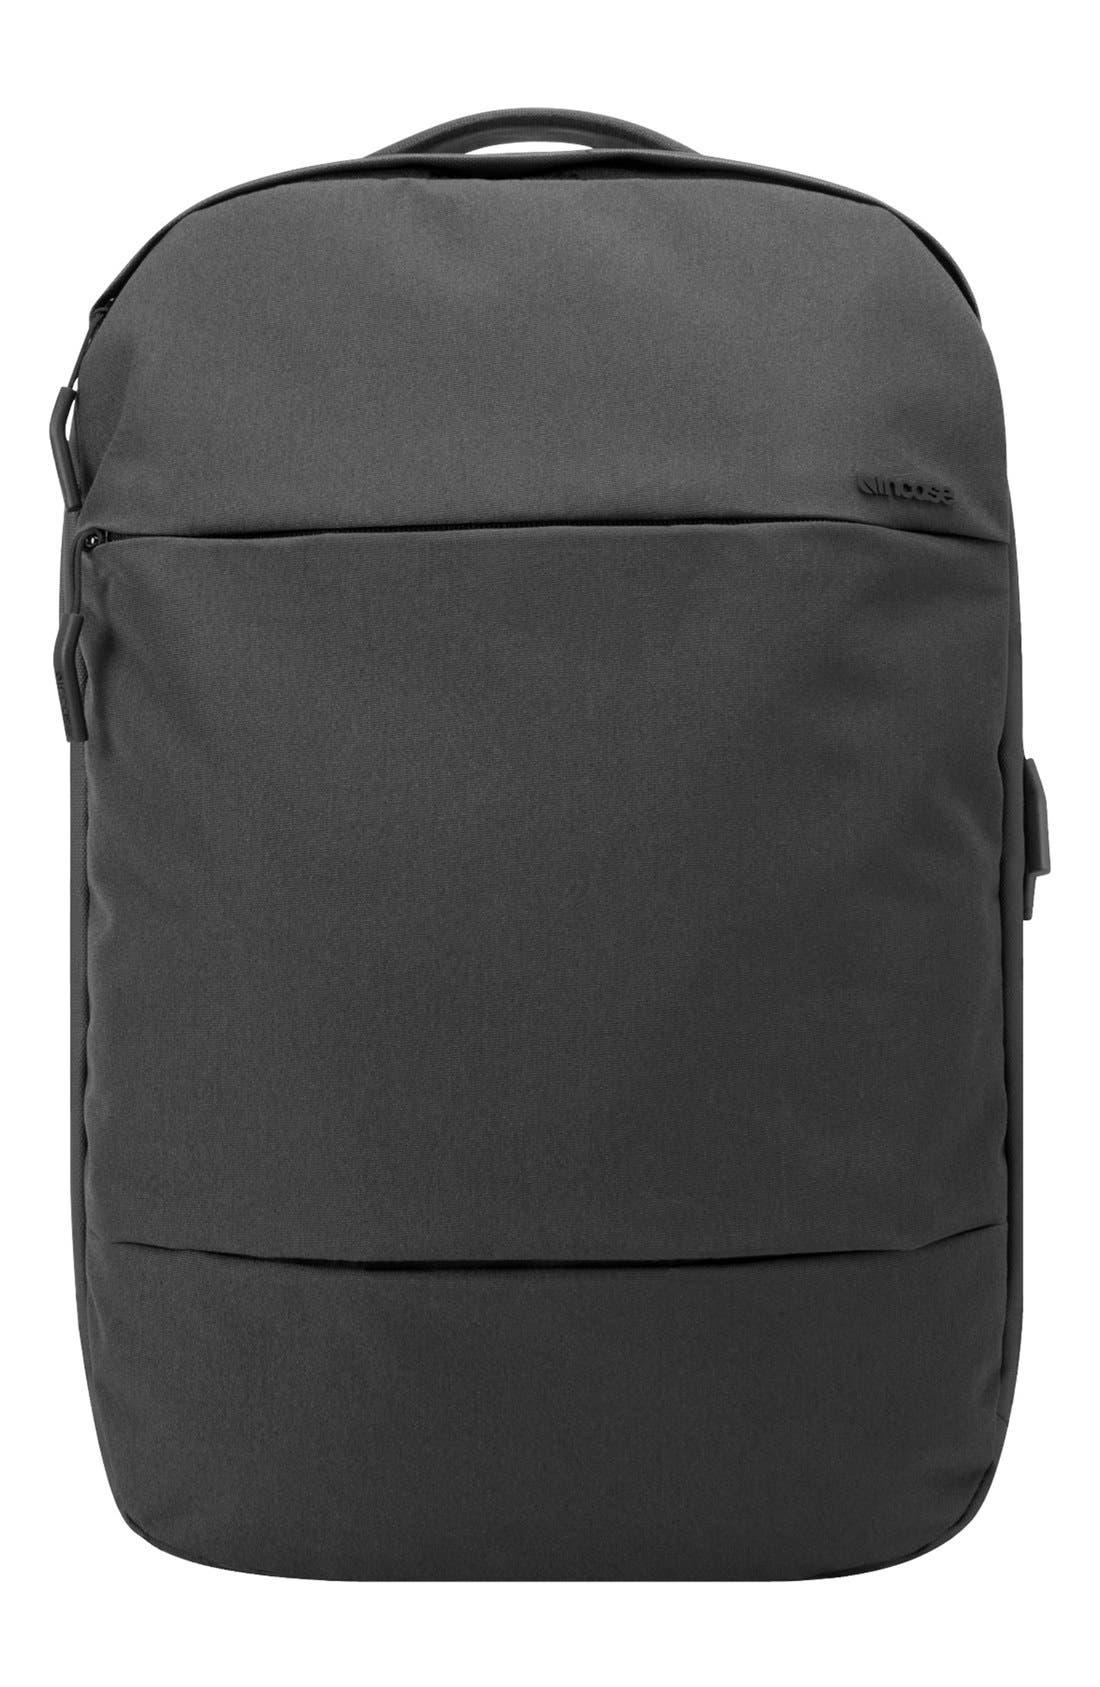 City Compact Backpack,                             Main thumbnail 1, color,                             001